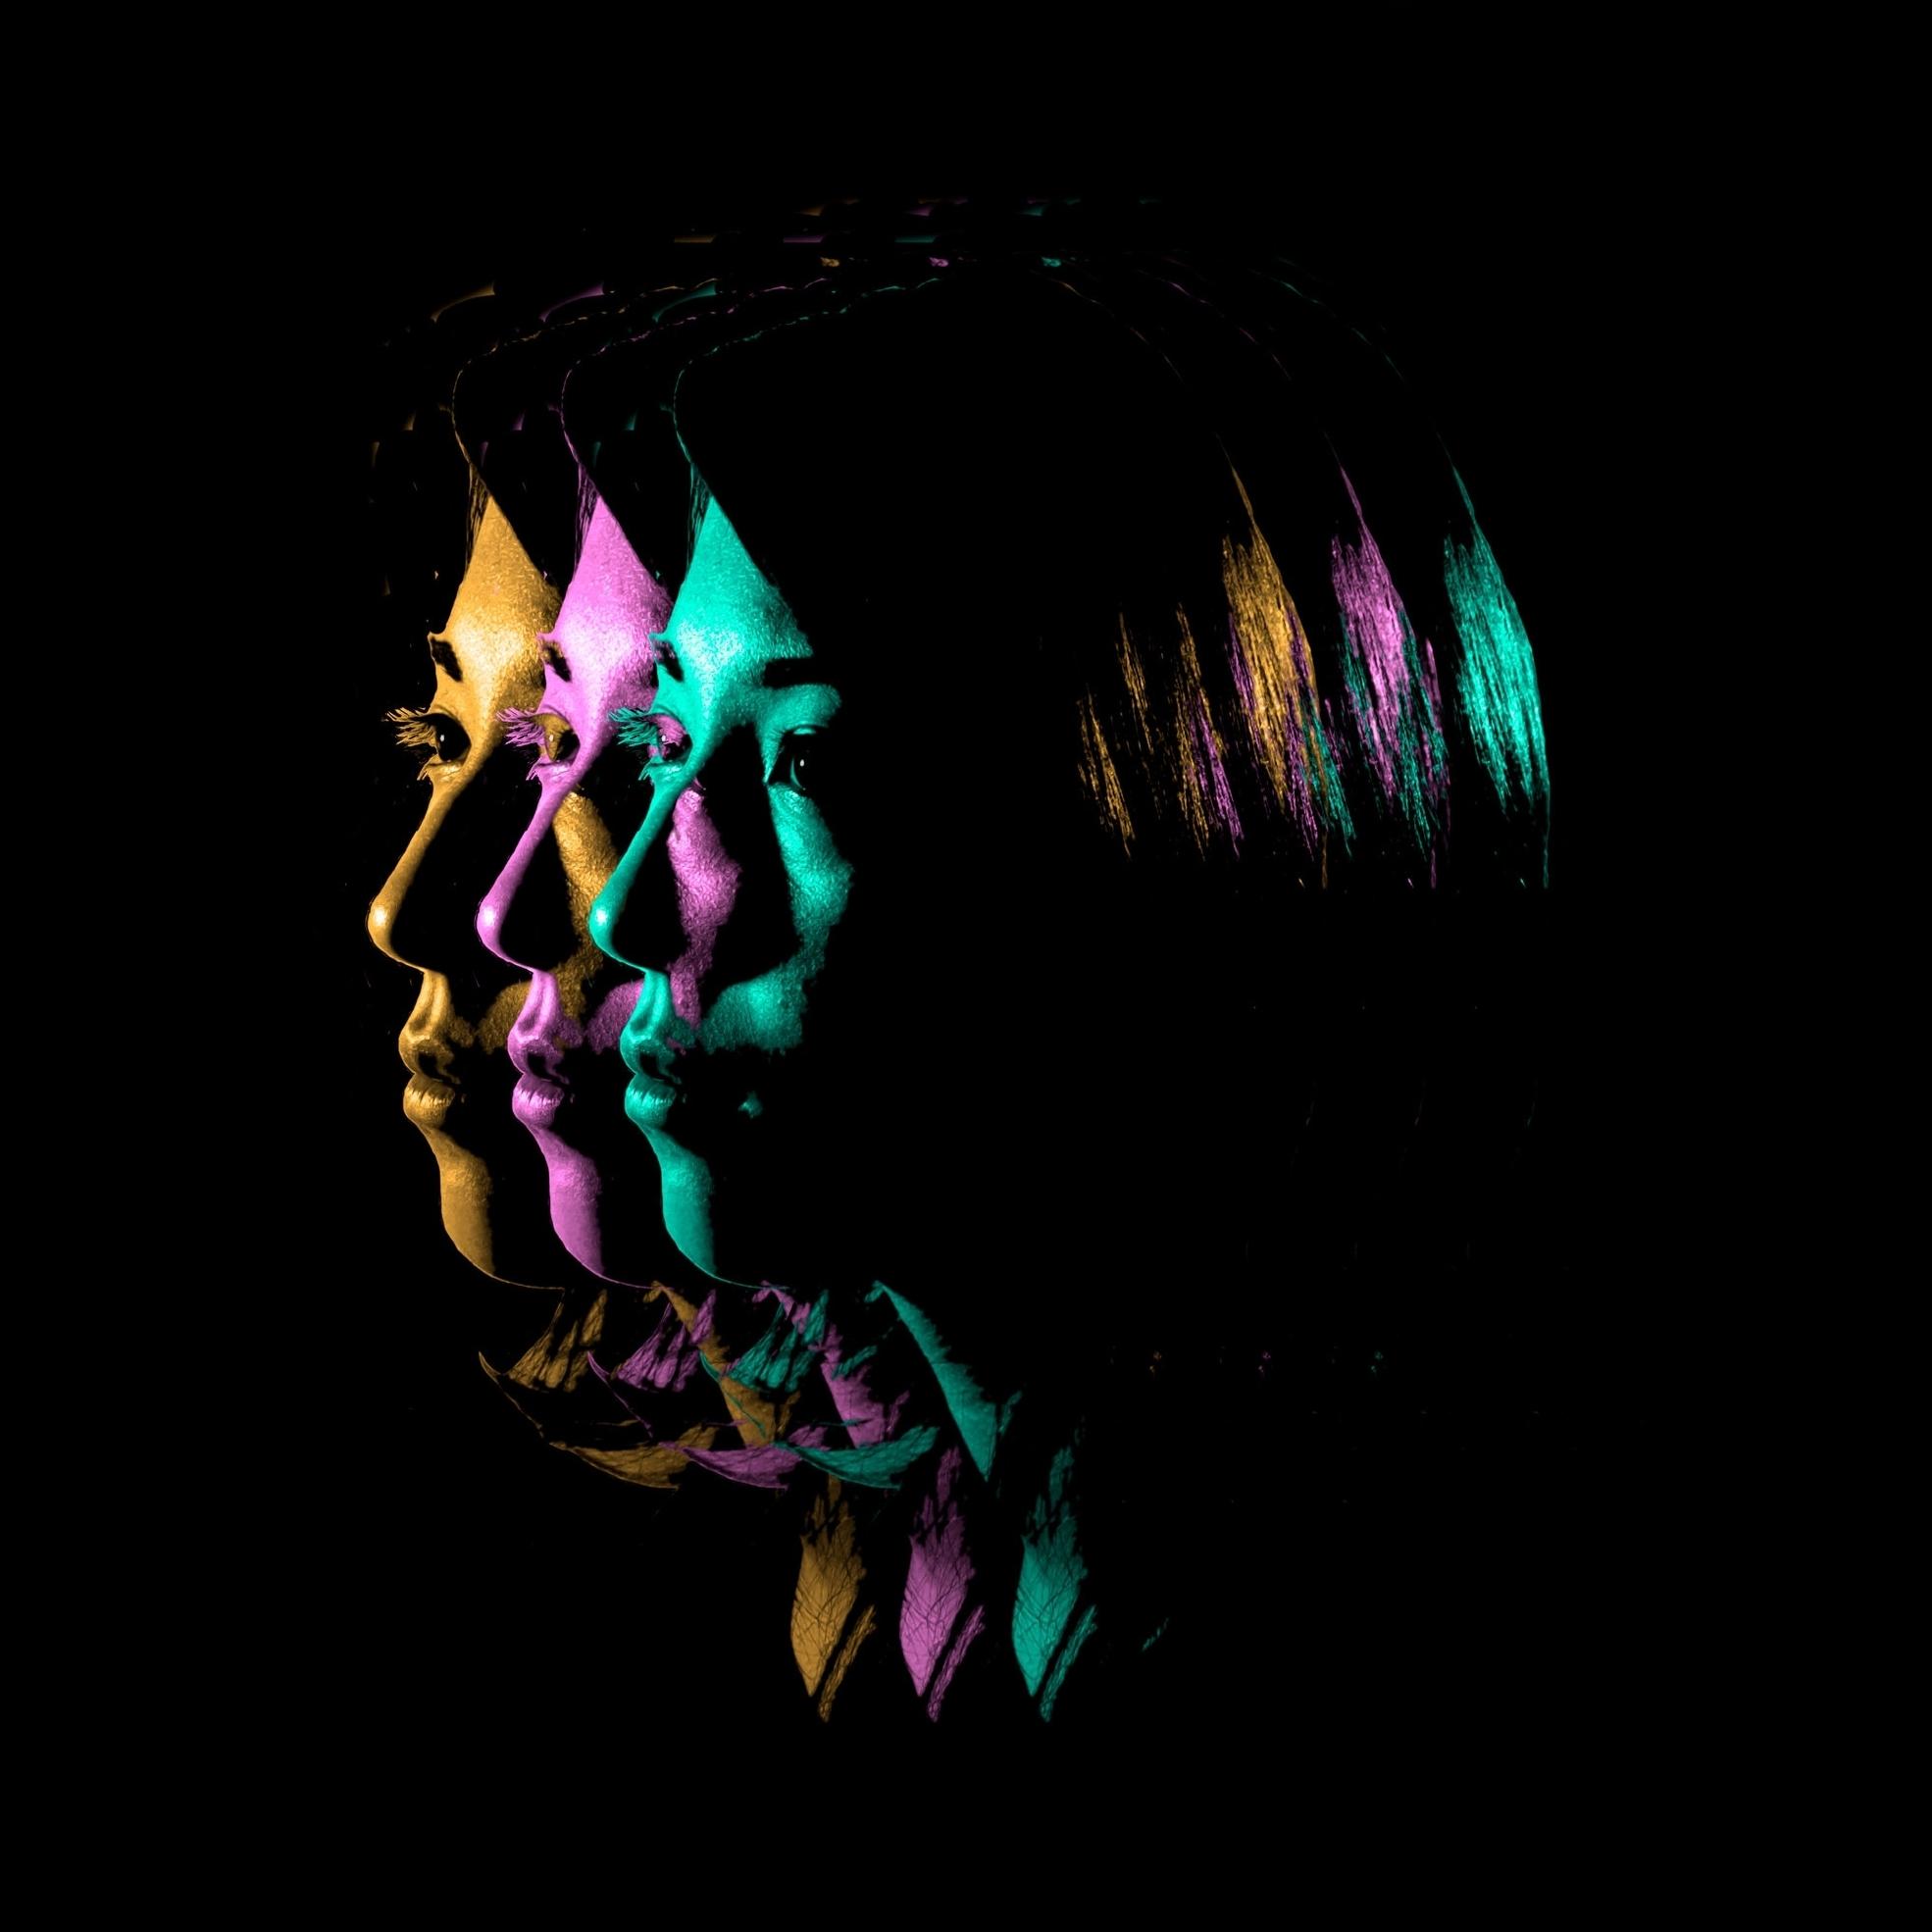 Bonnie_Tricolor.jpg